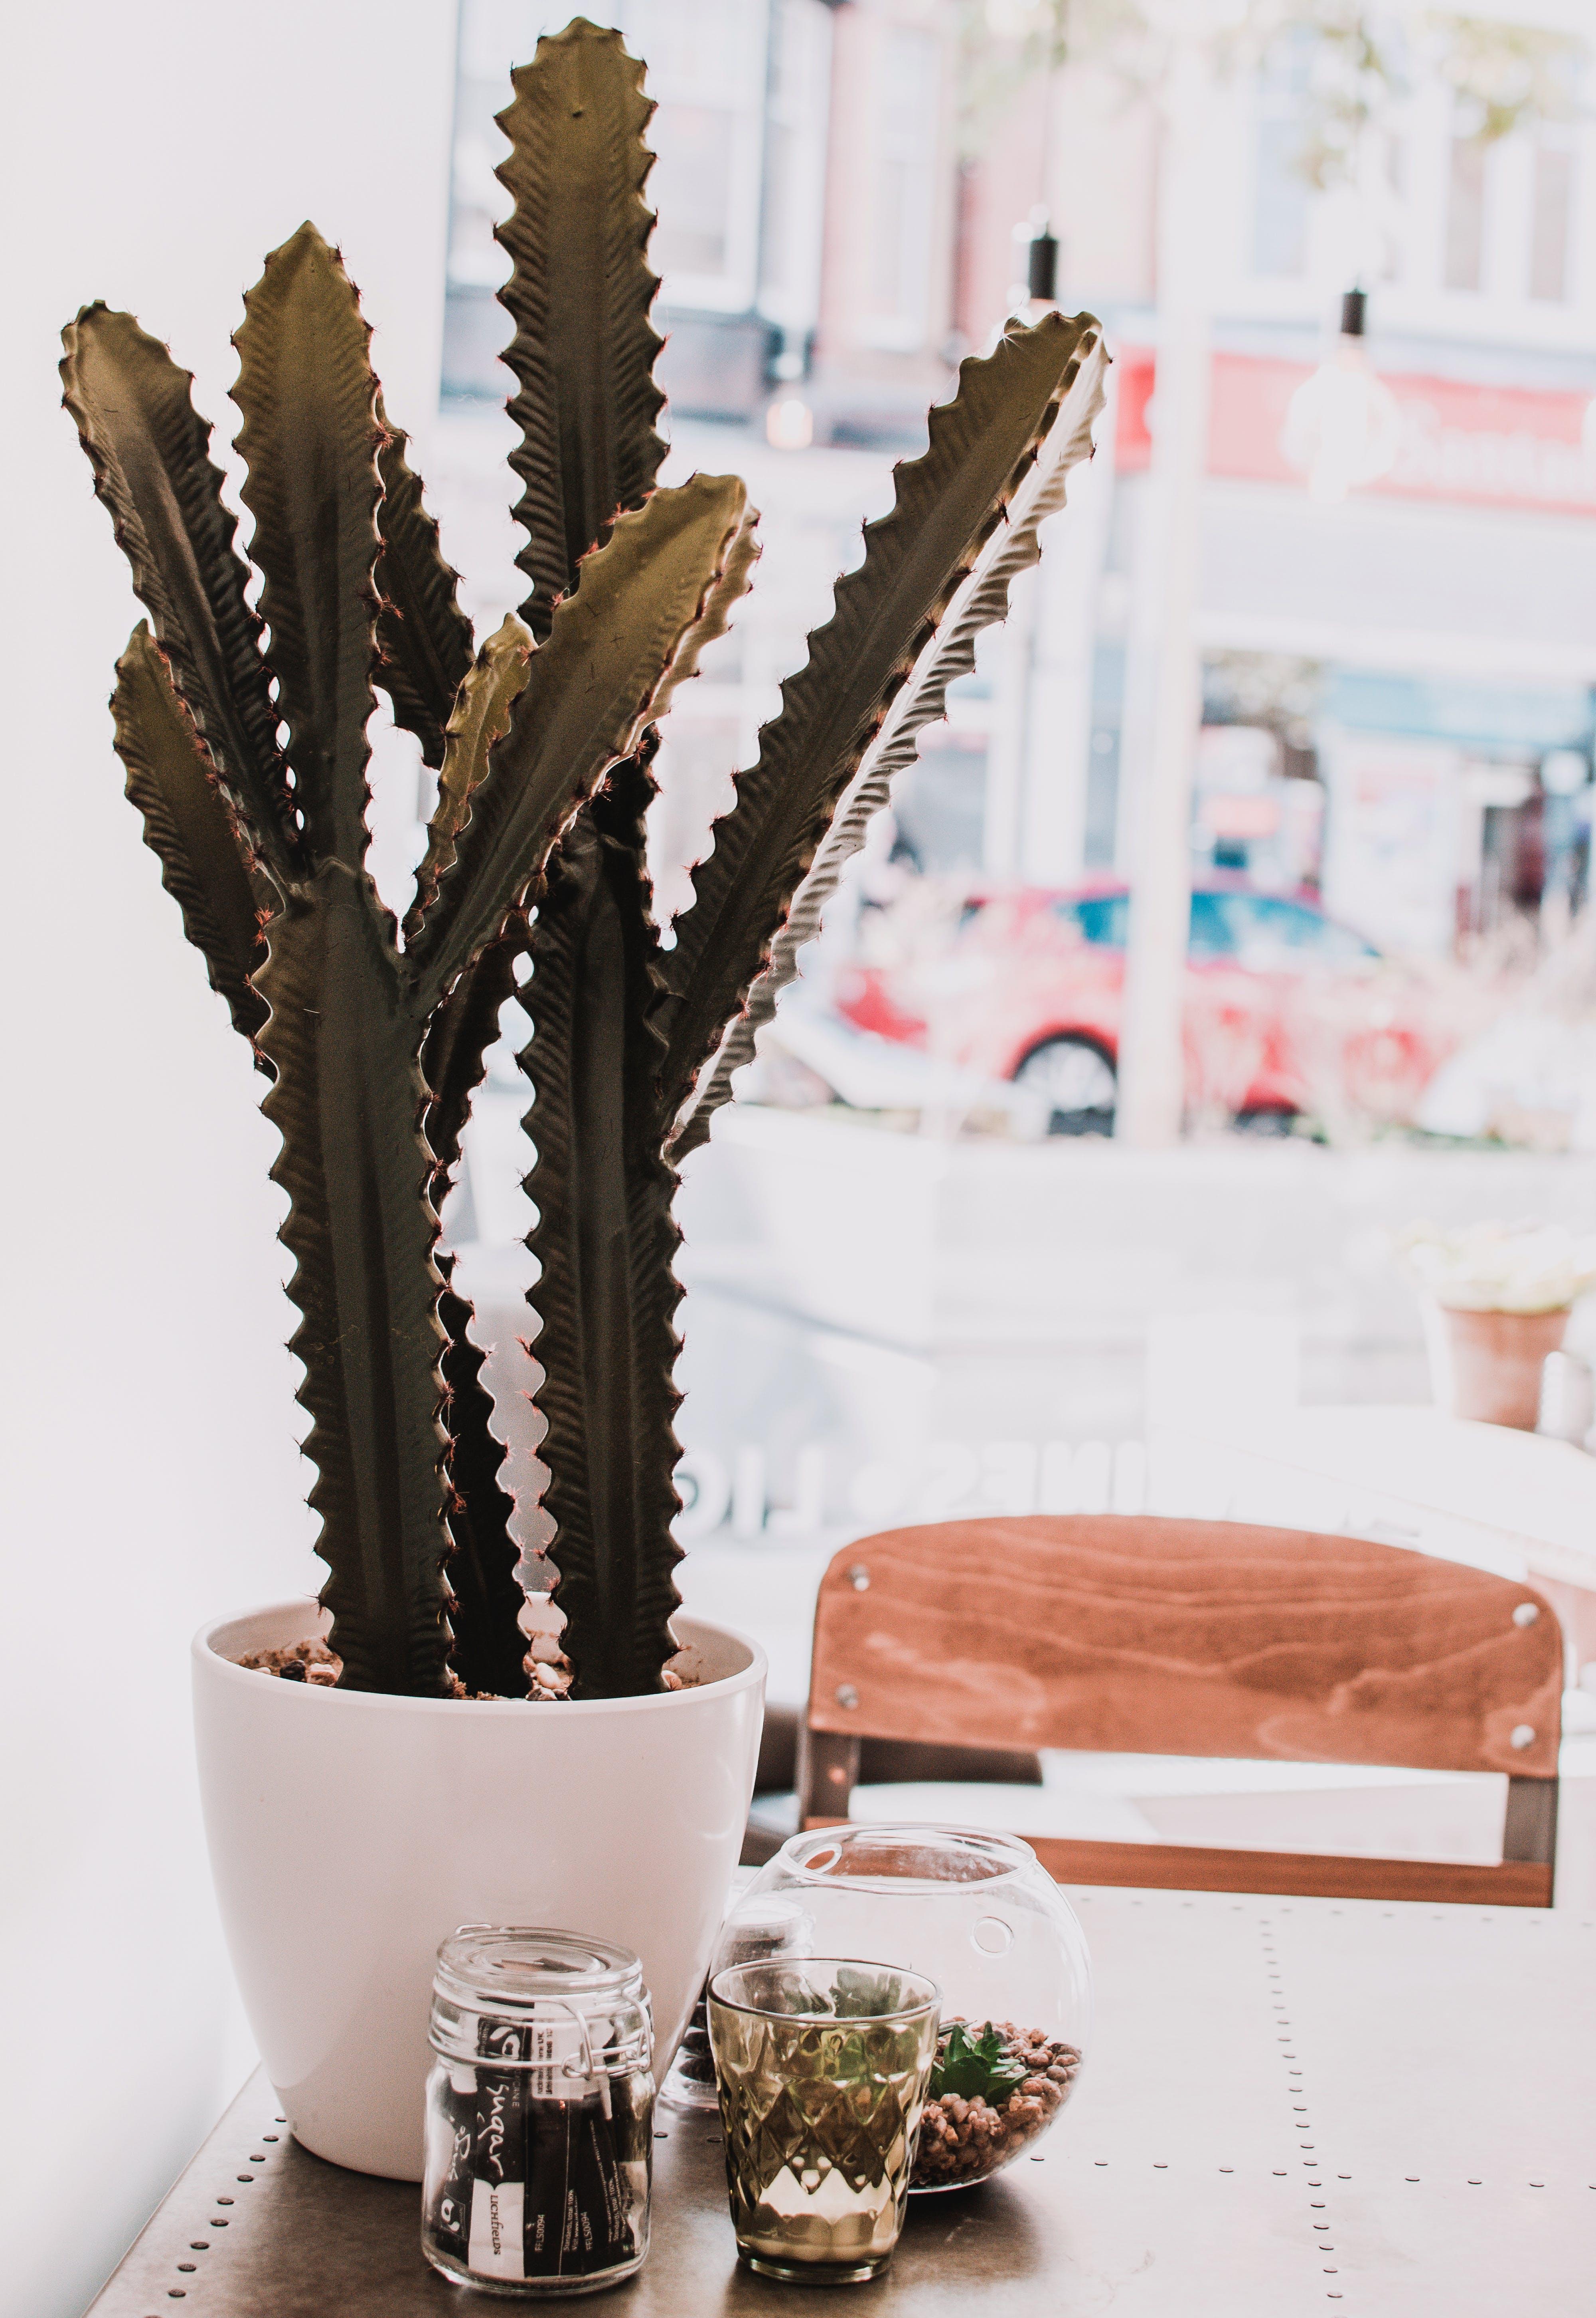 Green Cactus in Pot